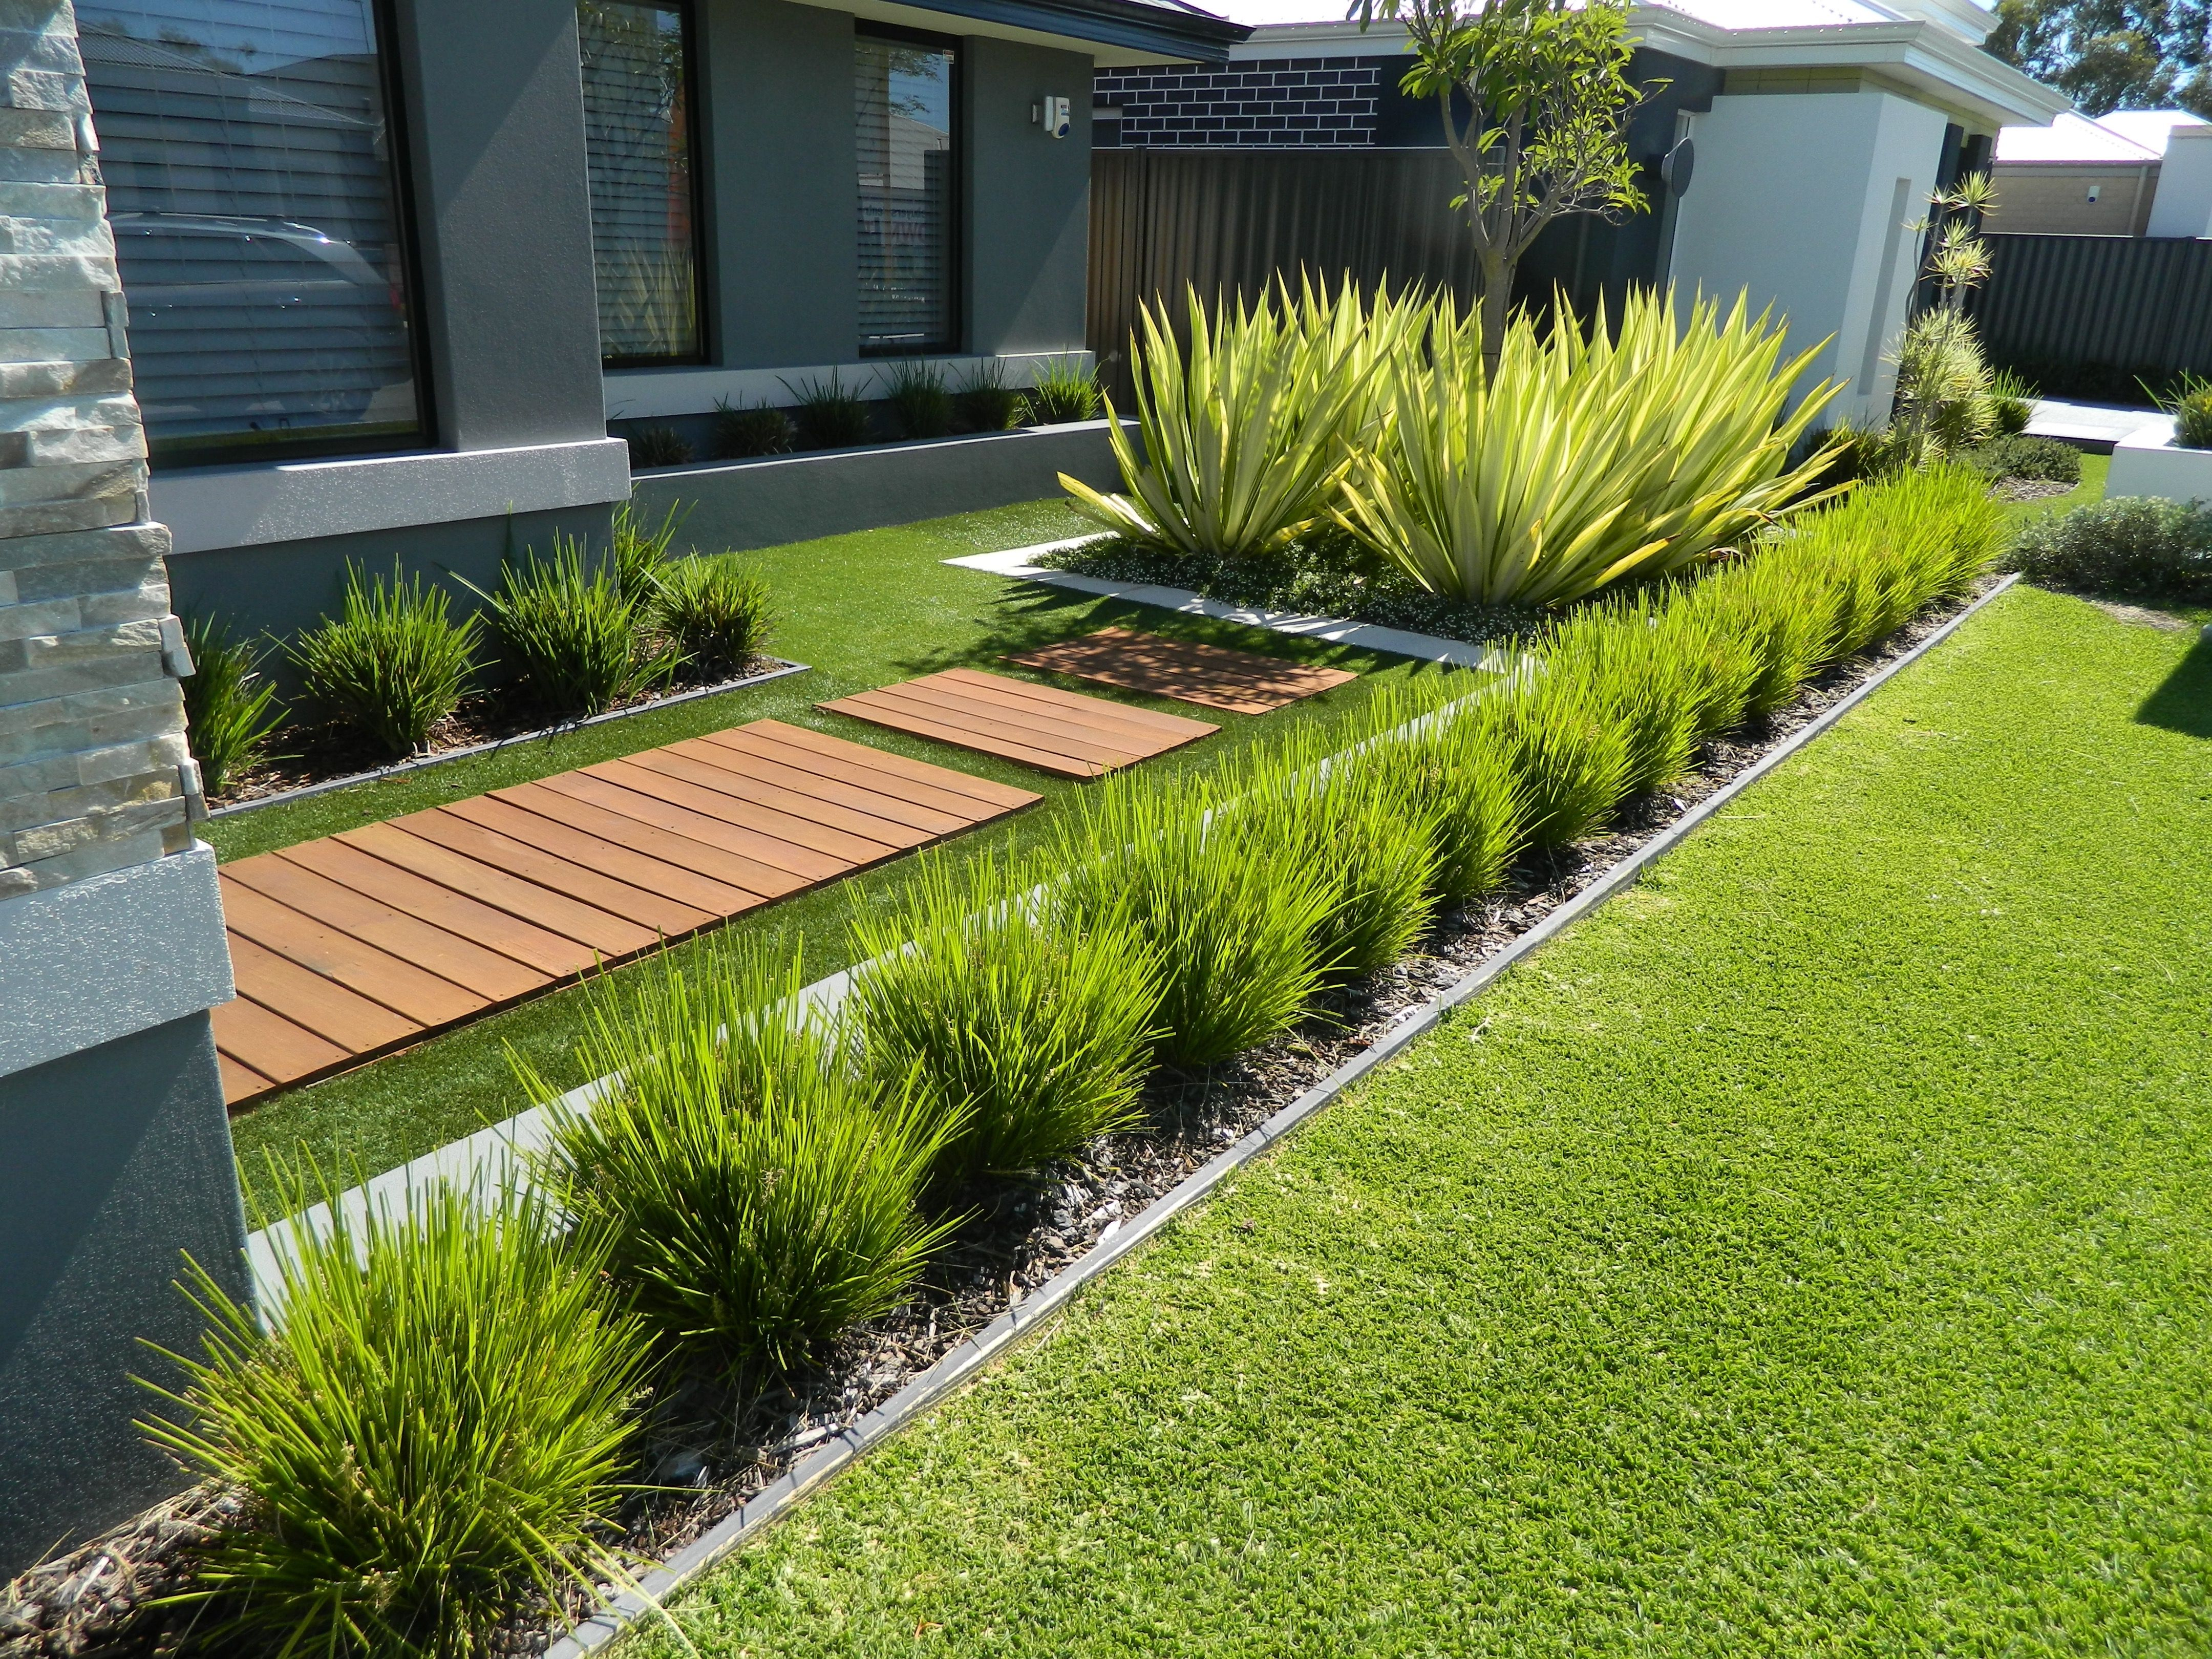 designs for flower beds